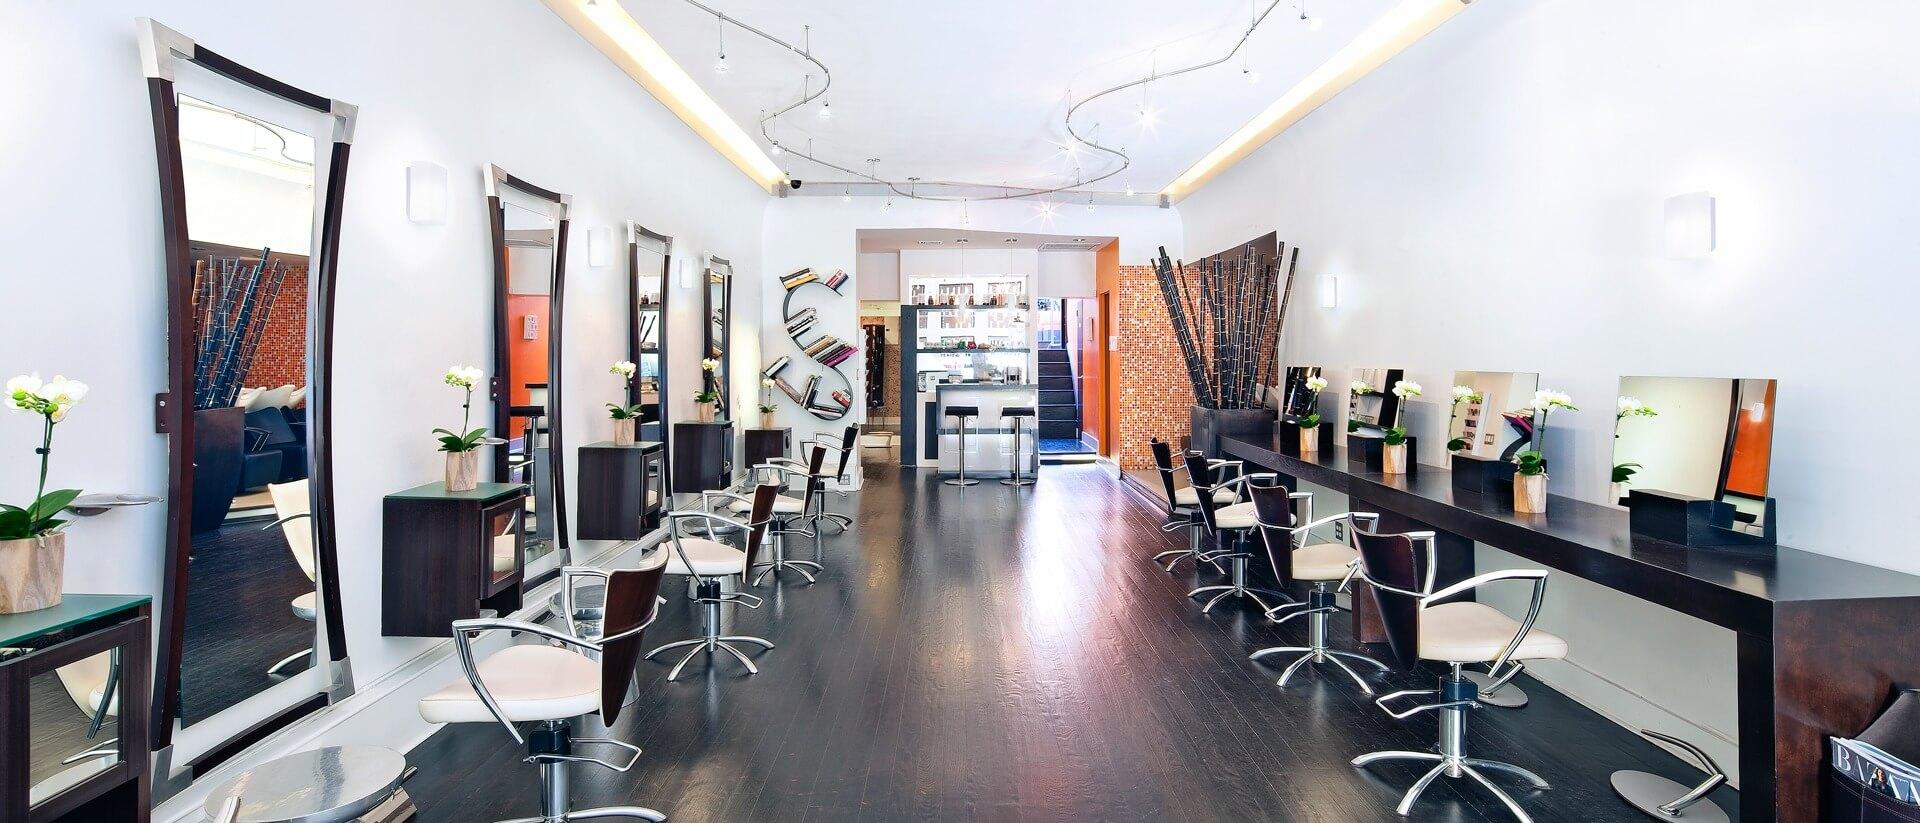 Fabio Scalia Salon Brooklyn New York interior